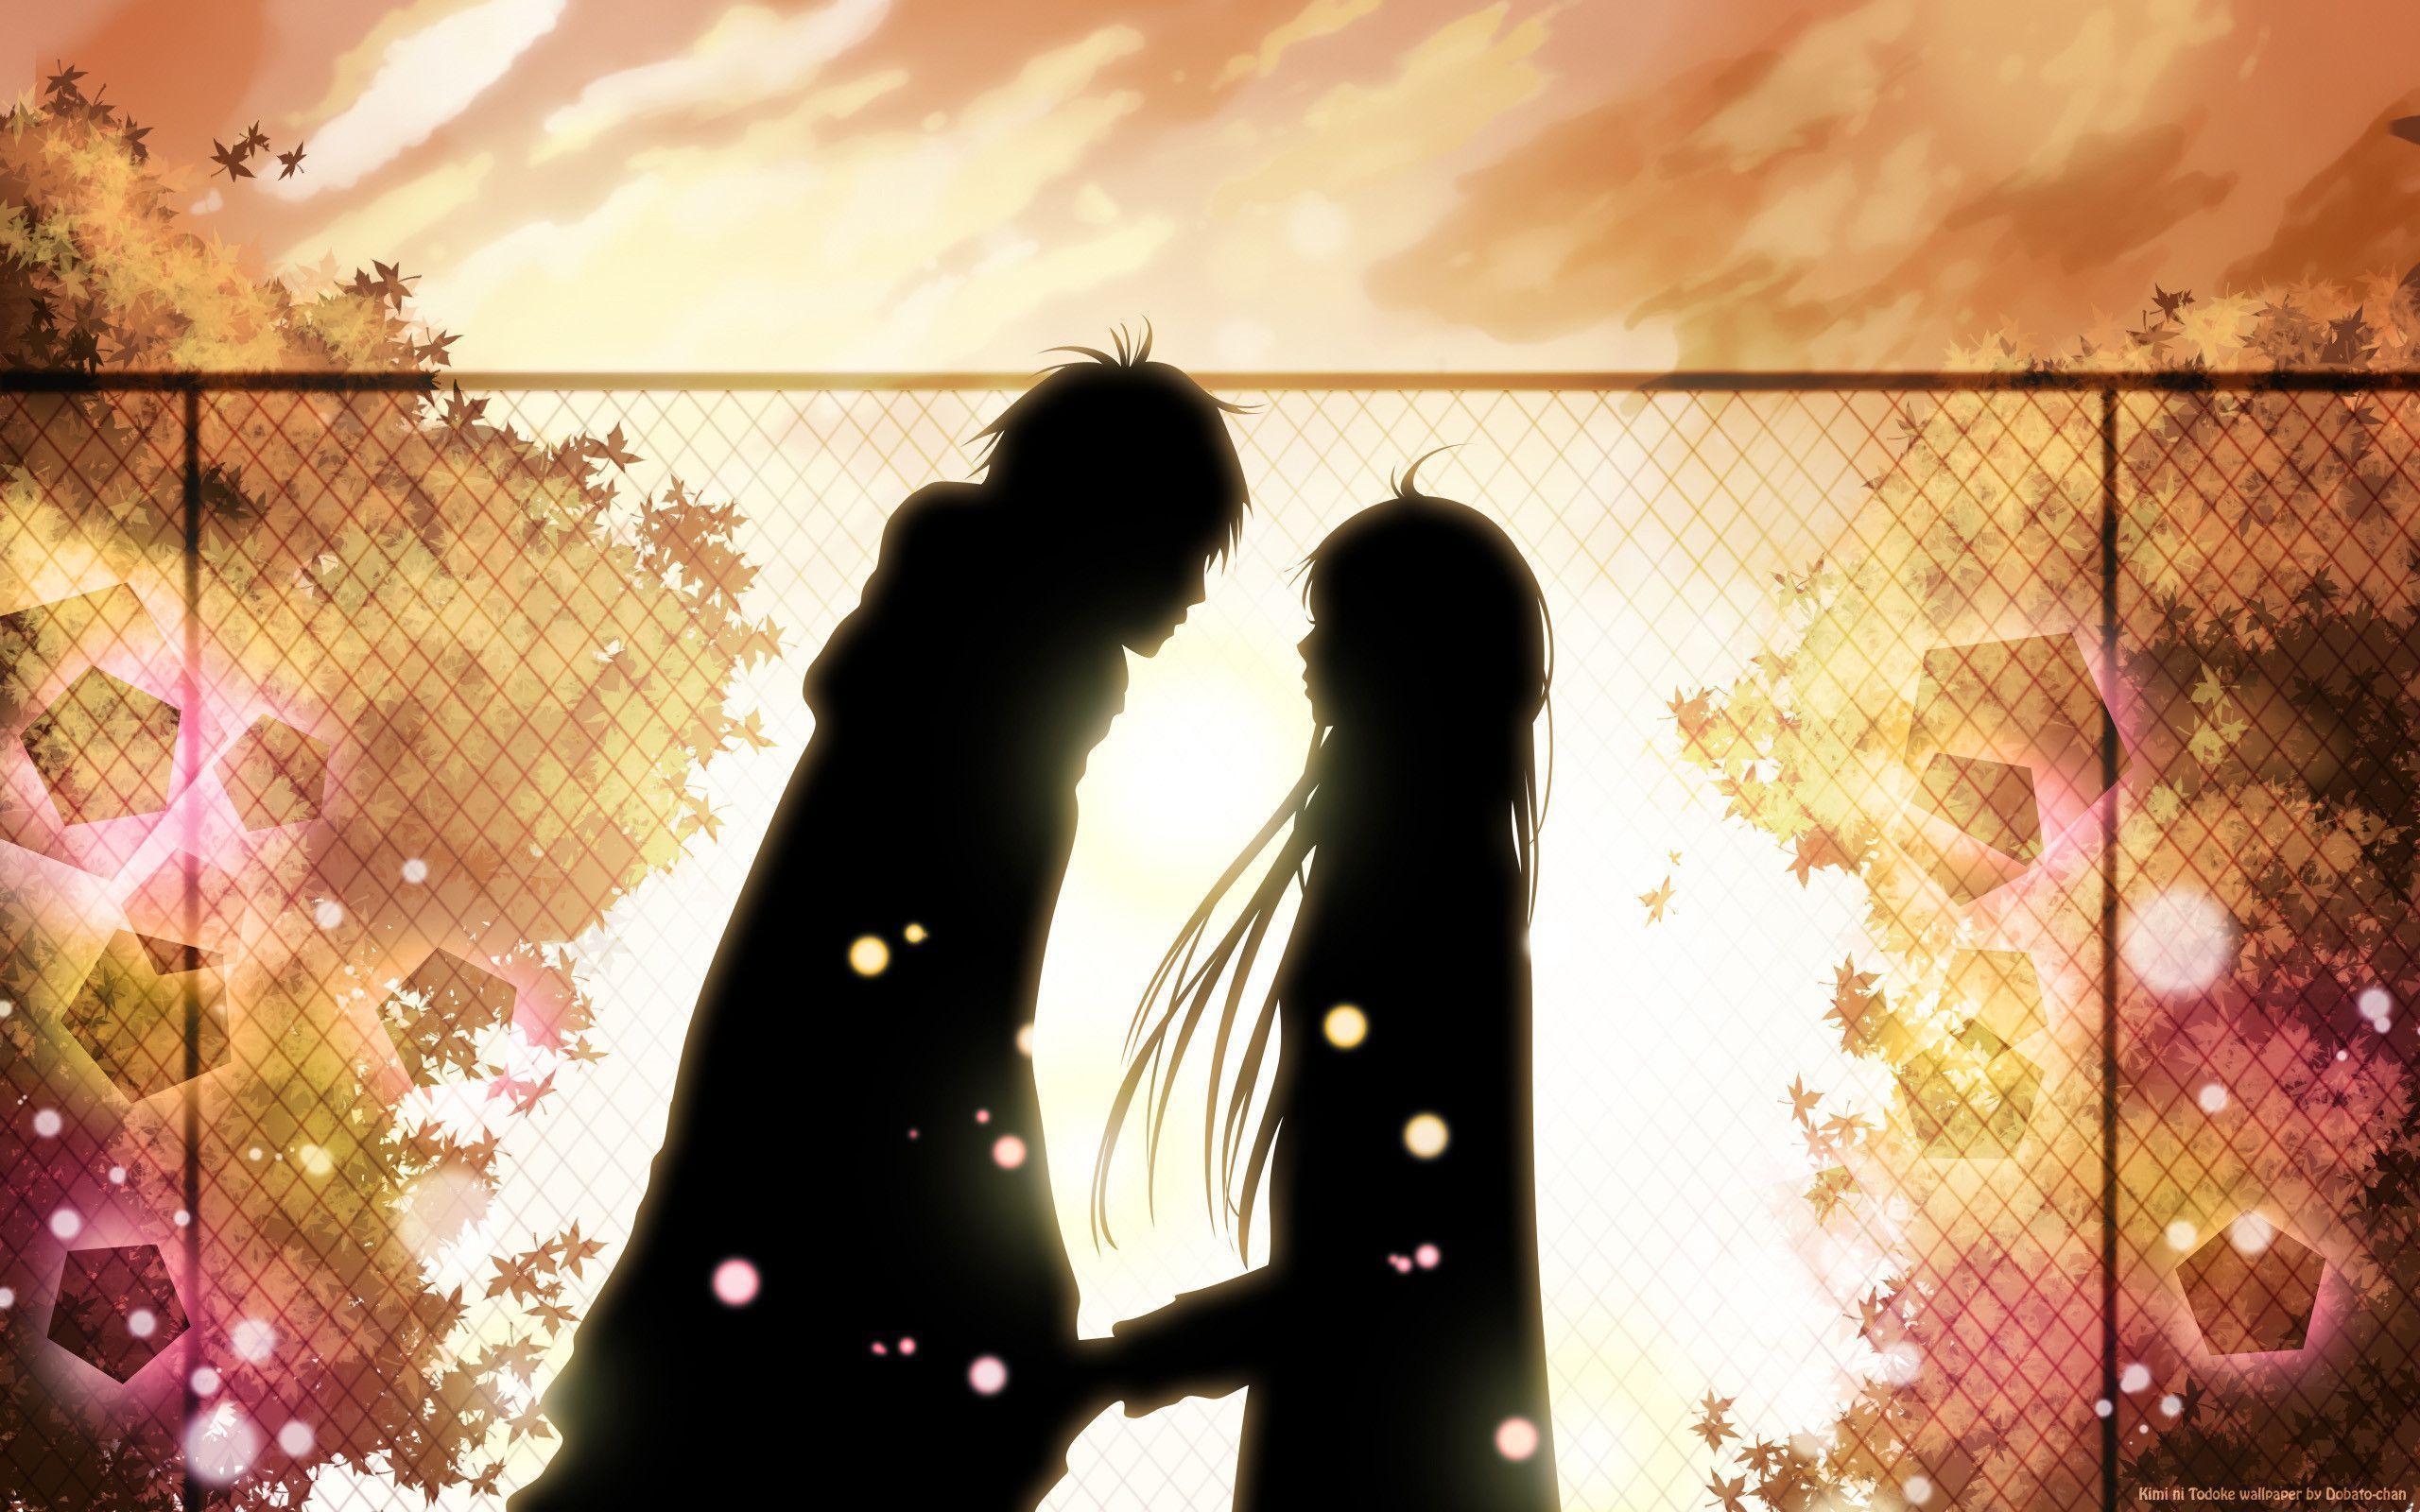 romantic anime wallpaper - photo #21